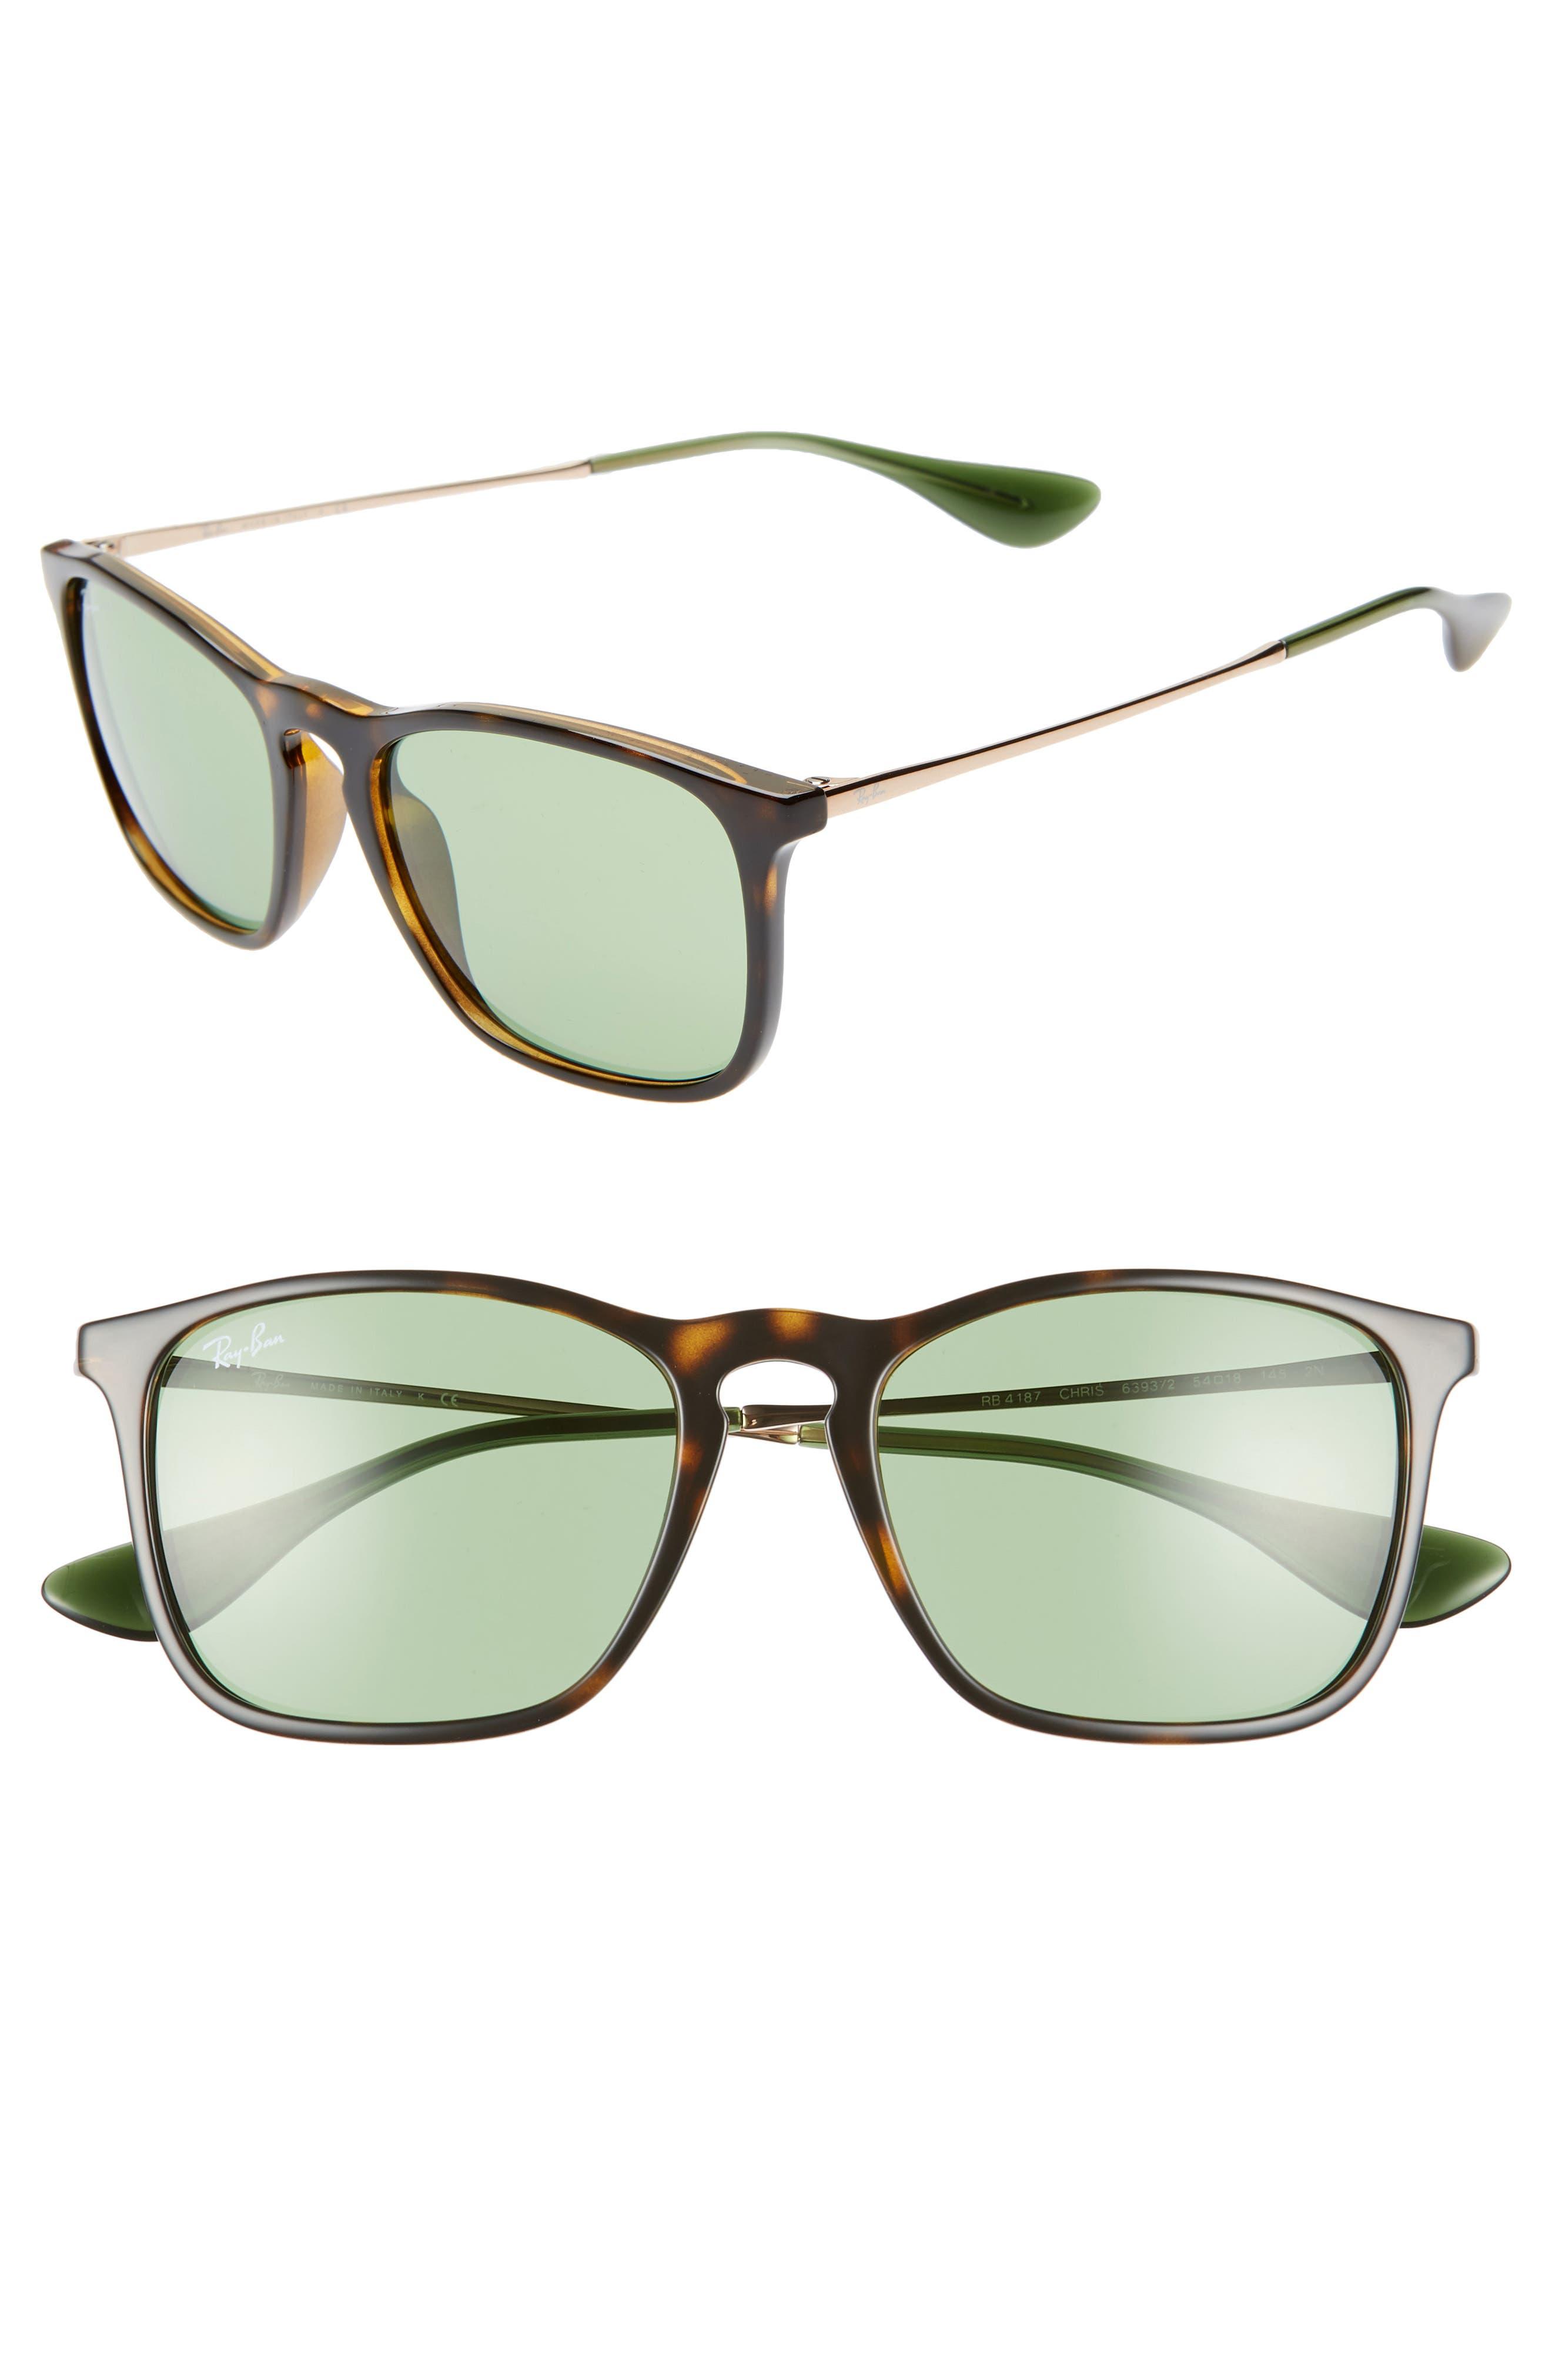 Ray-Ban 5m Sunglasses - Tortoise Green